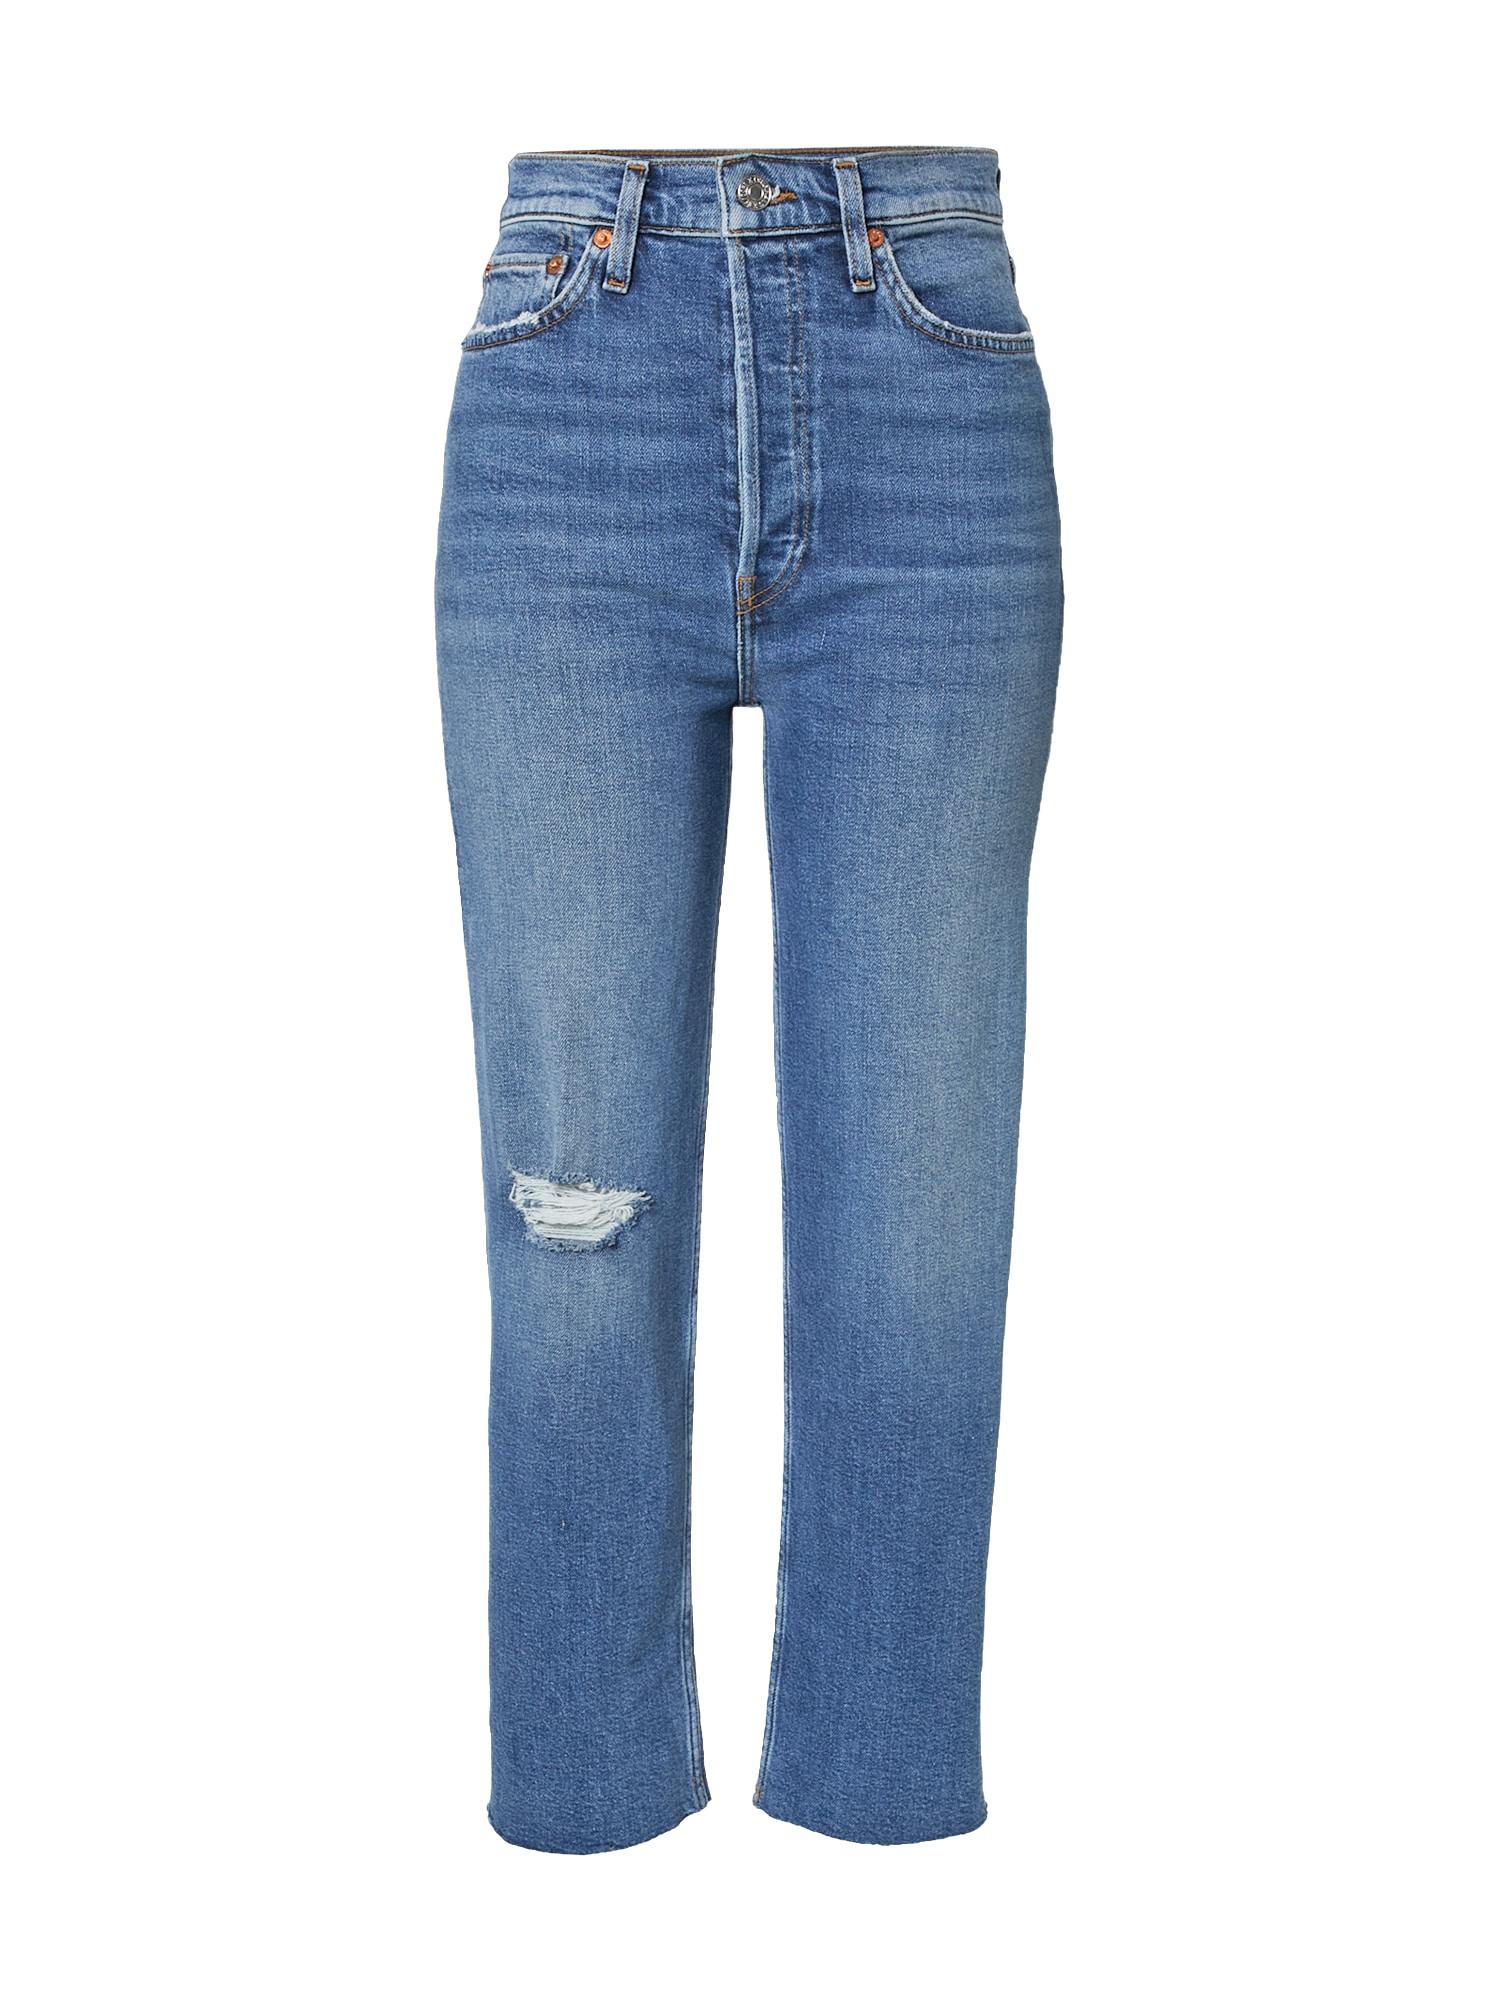 RE/DONE Džinsai tamsiai (džinso) mėlyna